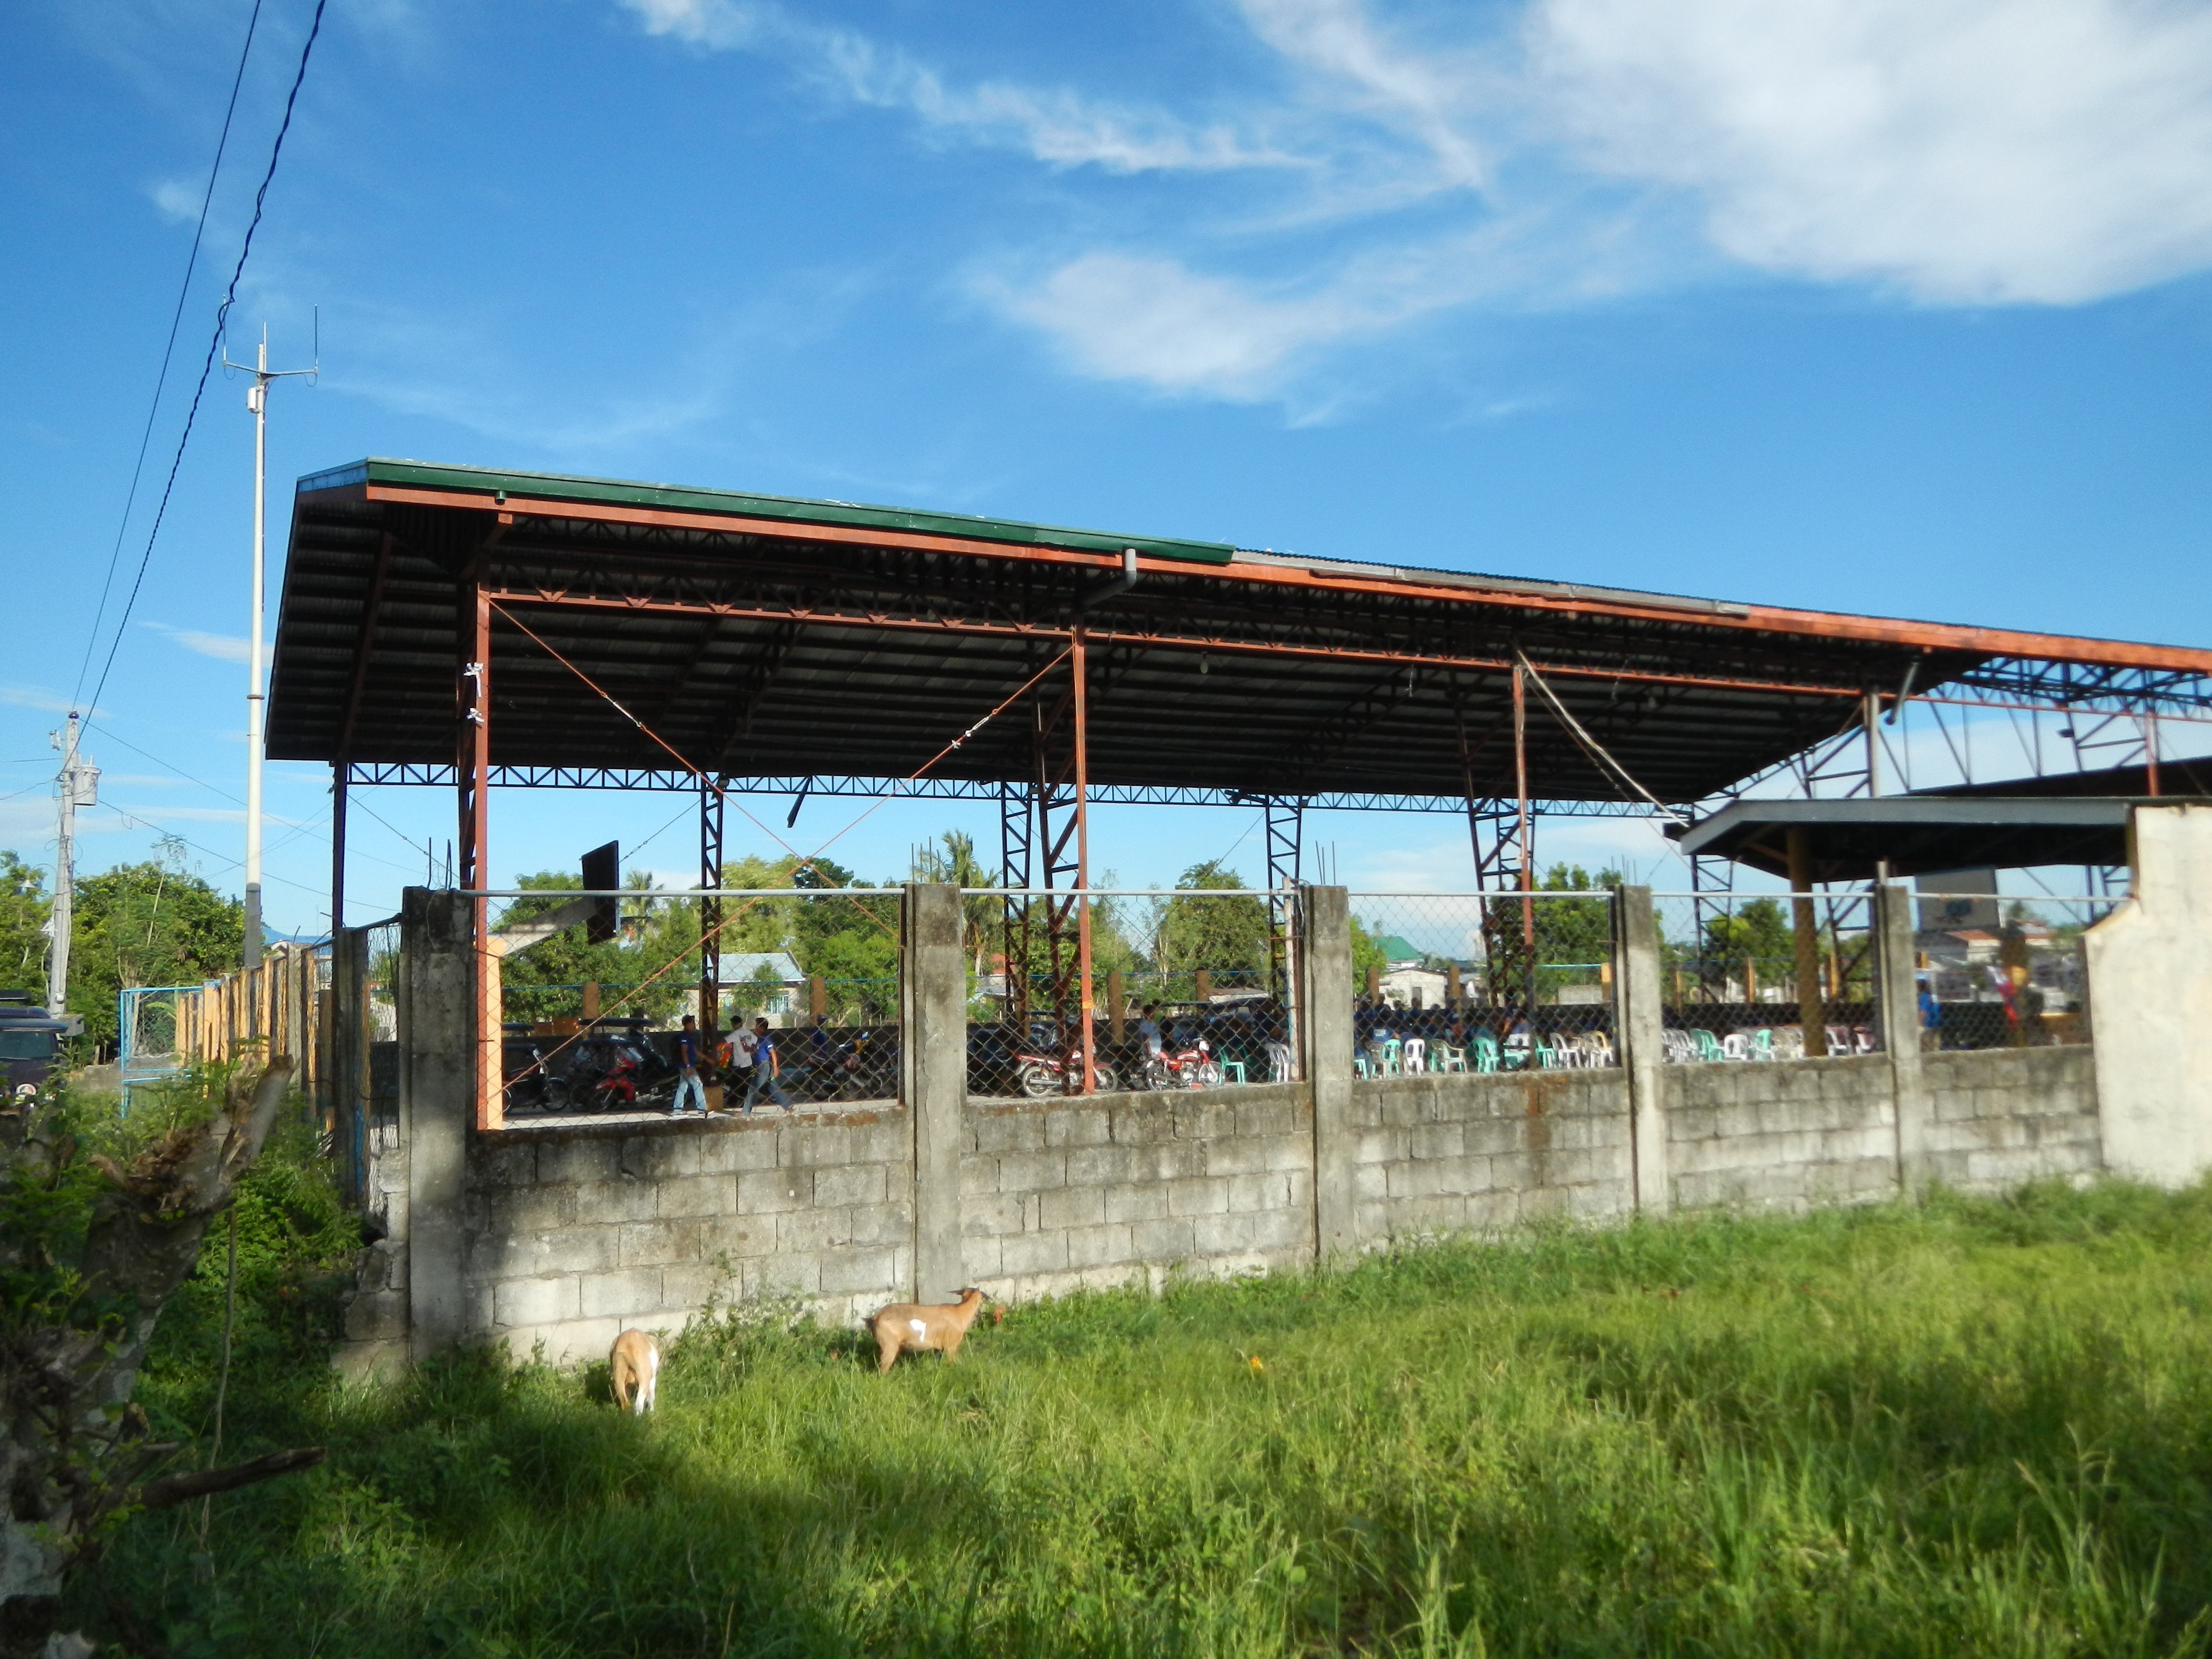 File:7605jfRizal Balanoy La Paz Hall Roads Tarlacfvf 13 ...